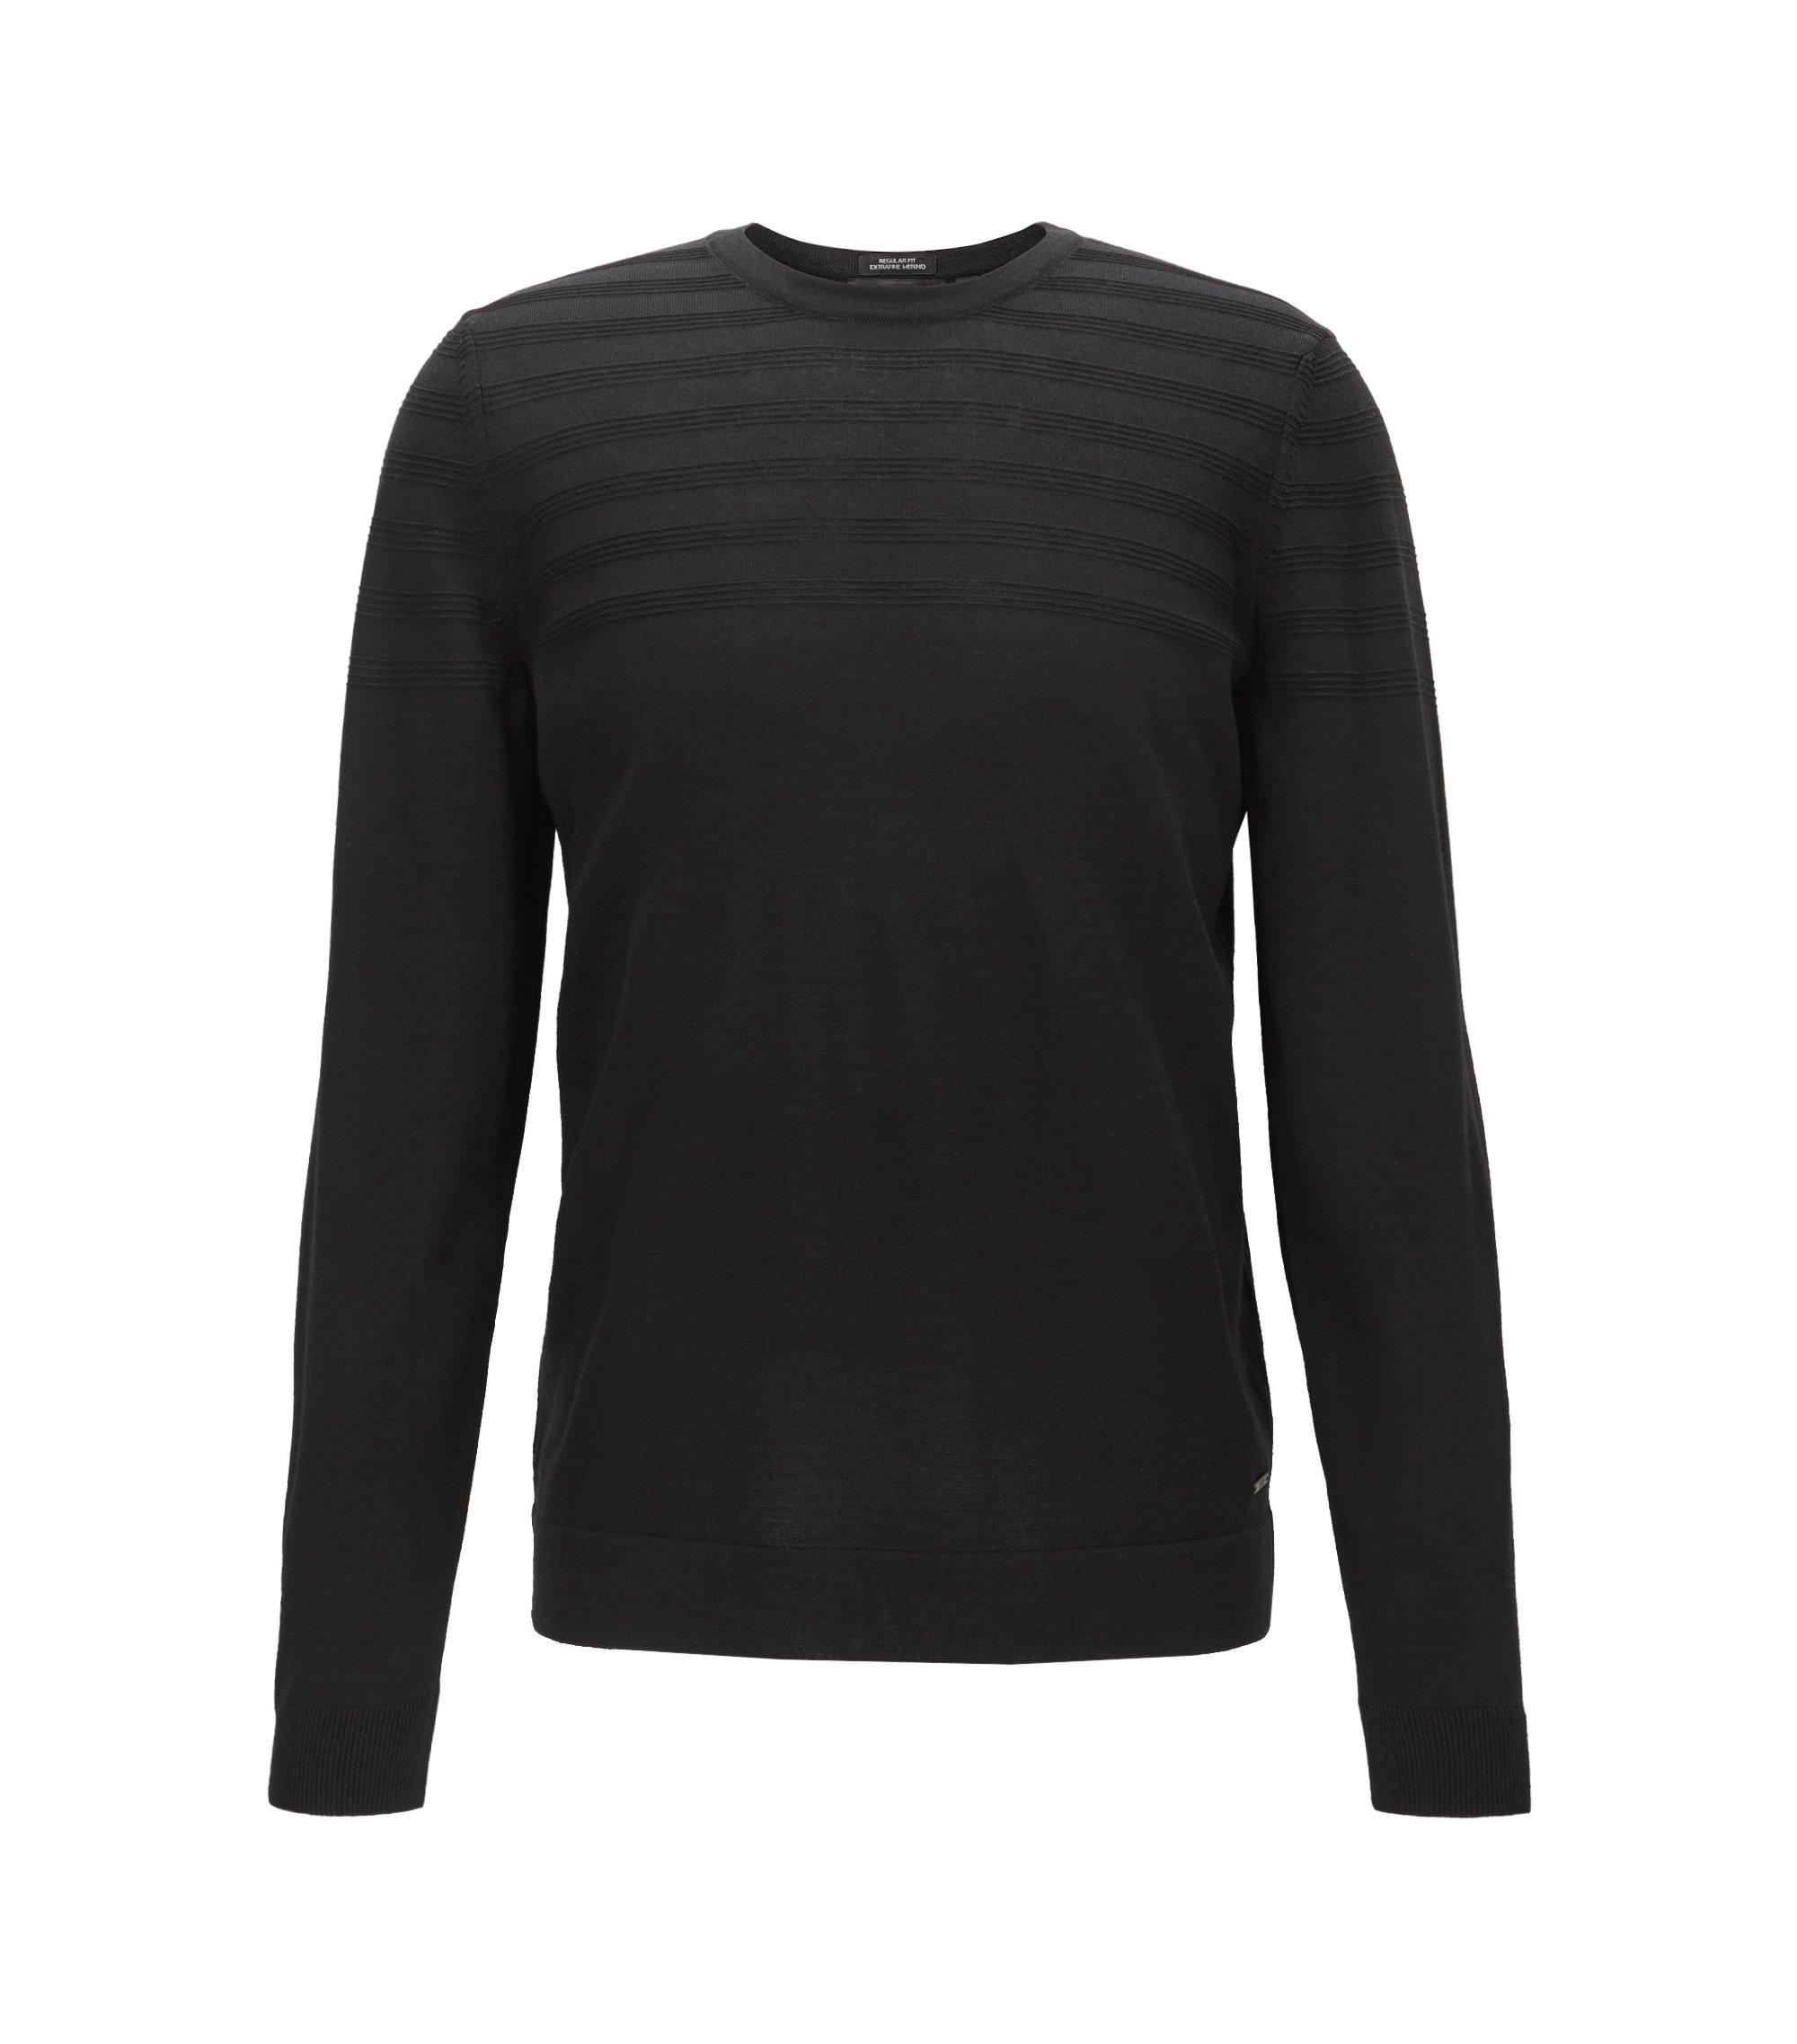 Jersey de cuello redondo en mezcla de lana con detalle con textura, Negro